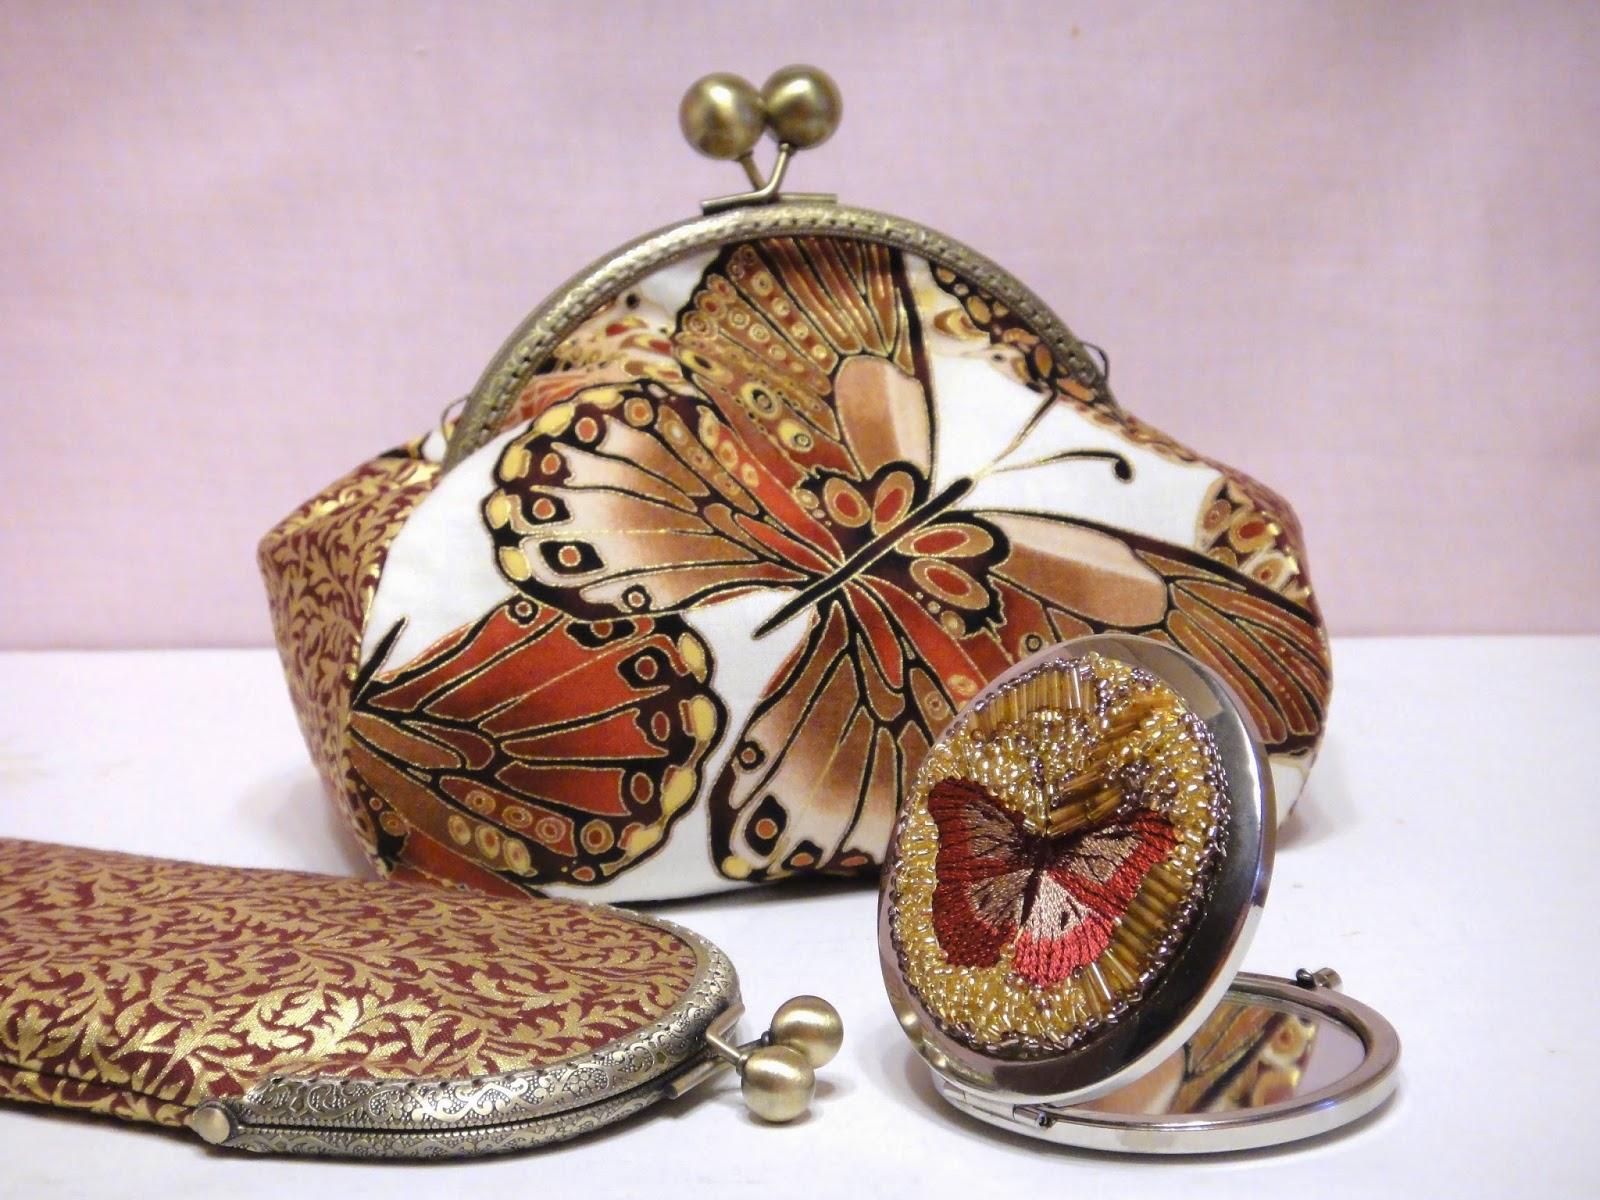 Косметичка, очешник, красивое зеркальце - подарок девушке или подарок подруге